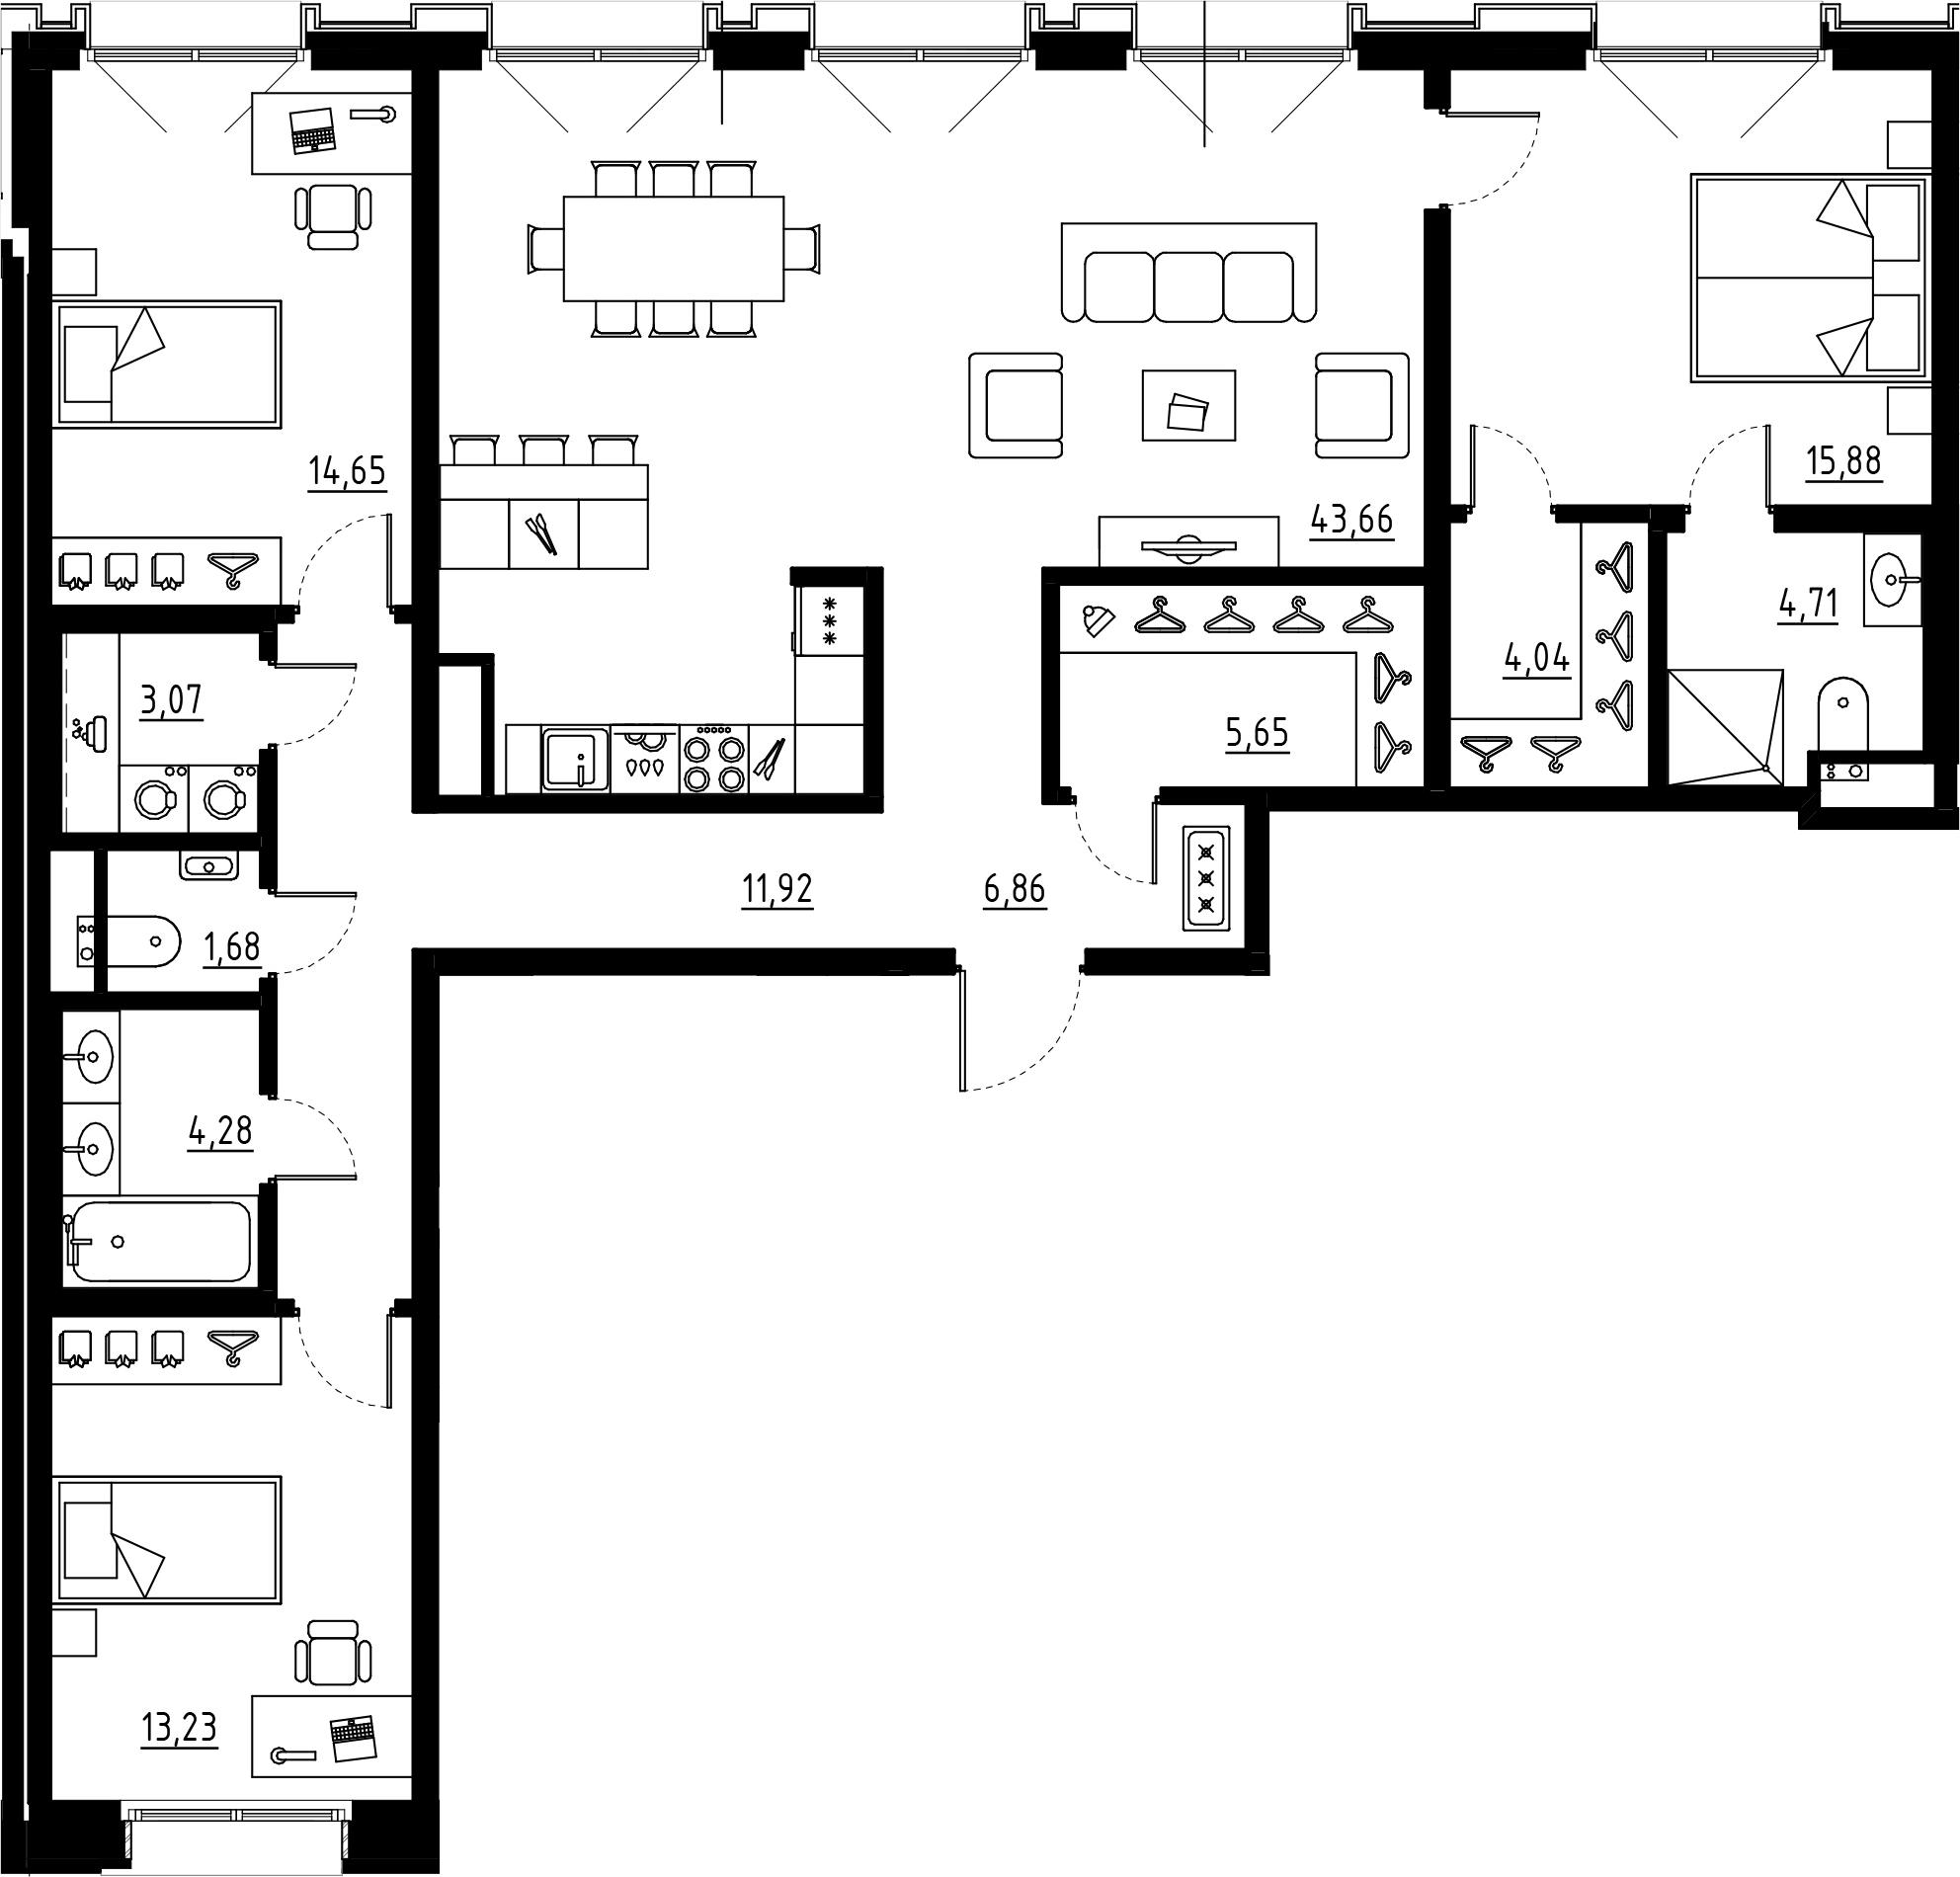 4Е-комнатная квартира, 129.63 м², 2 этаж – Планировка